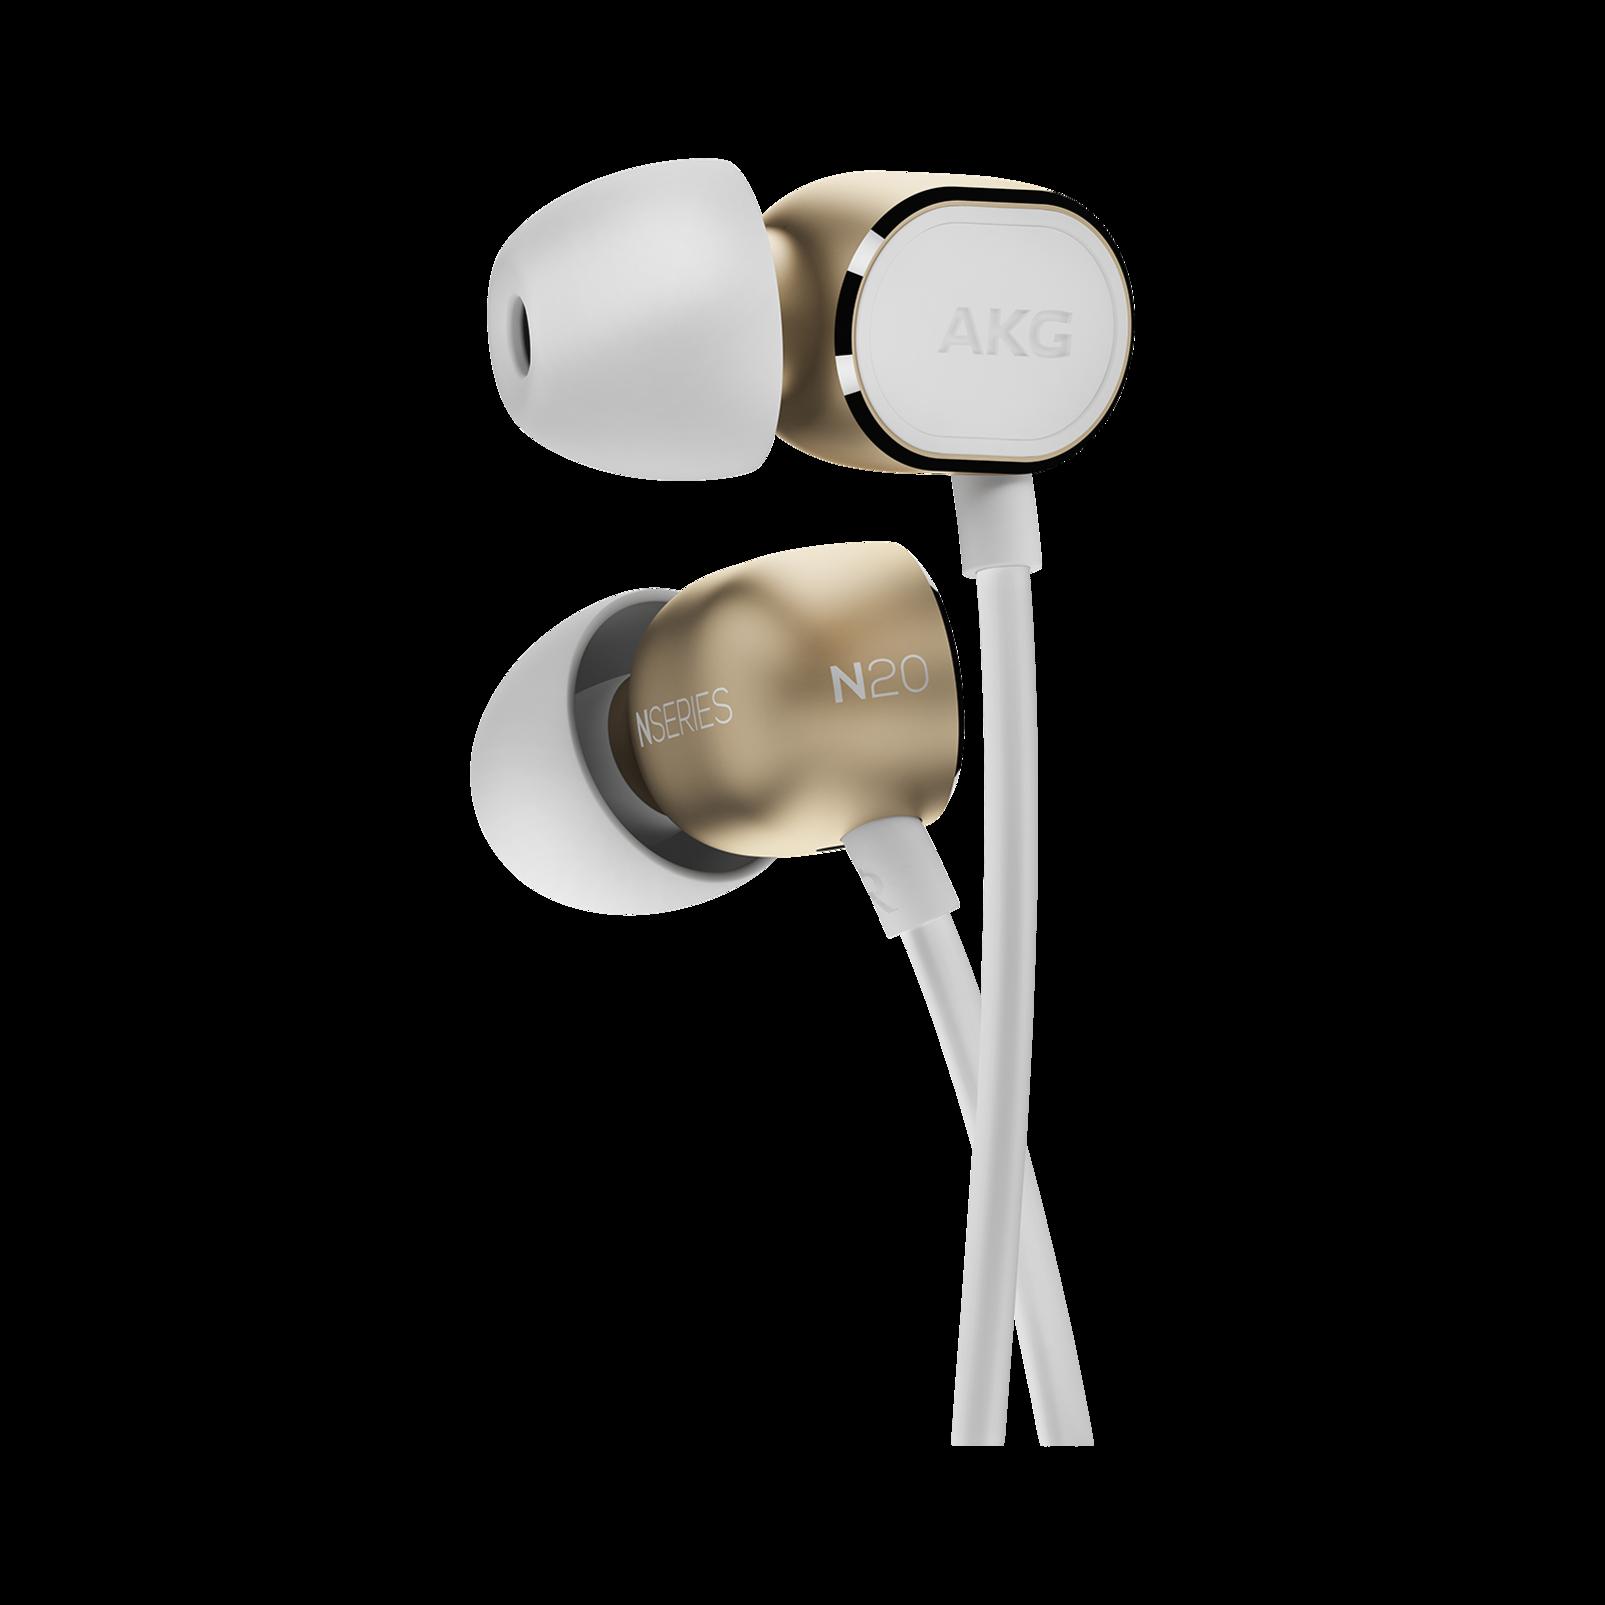 N20 - Gold - Reference class in-ear headphones in aluminum enclousure - Detailshot 1